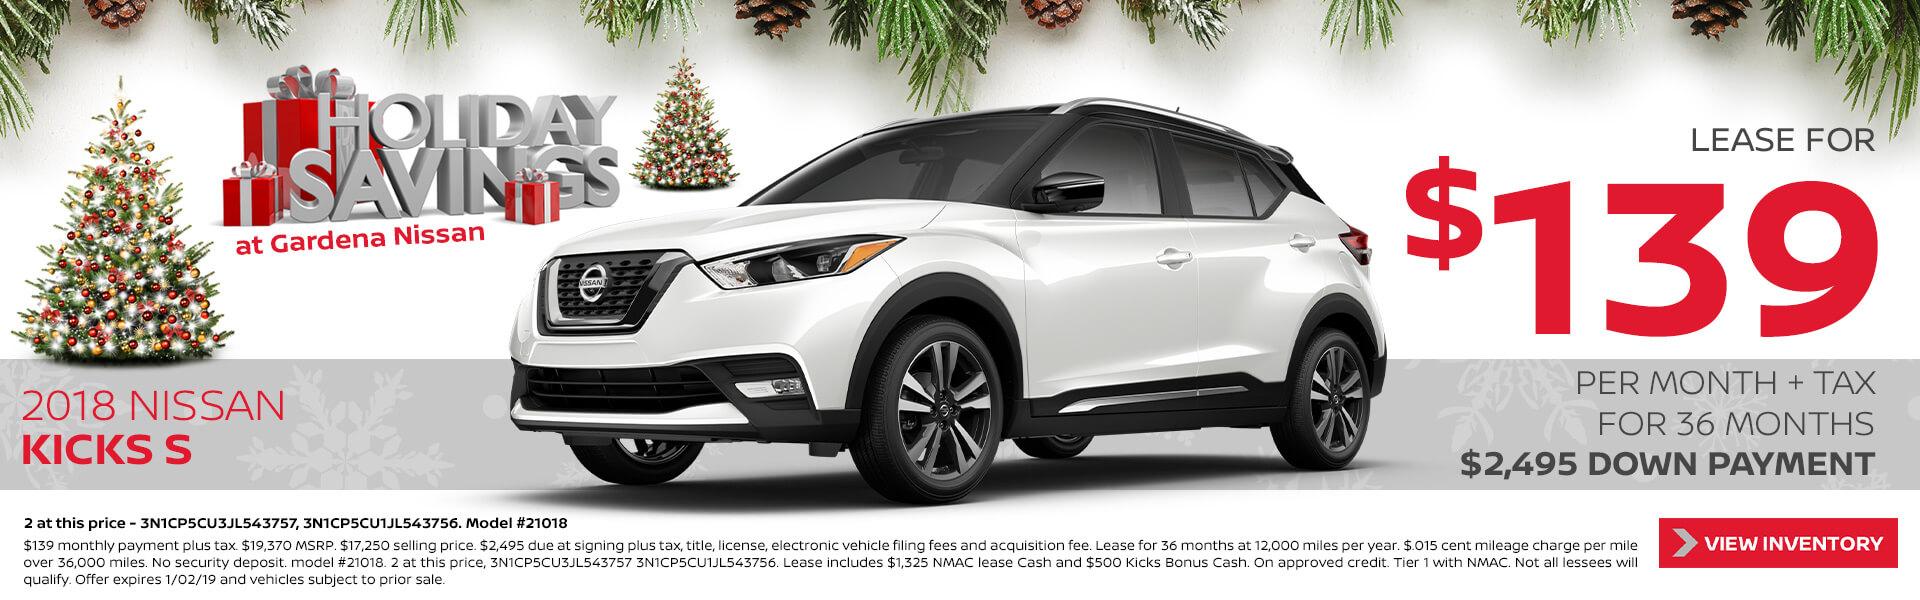 Nissan Kicks $139 Lease